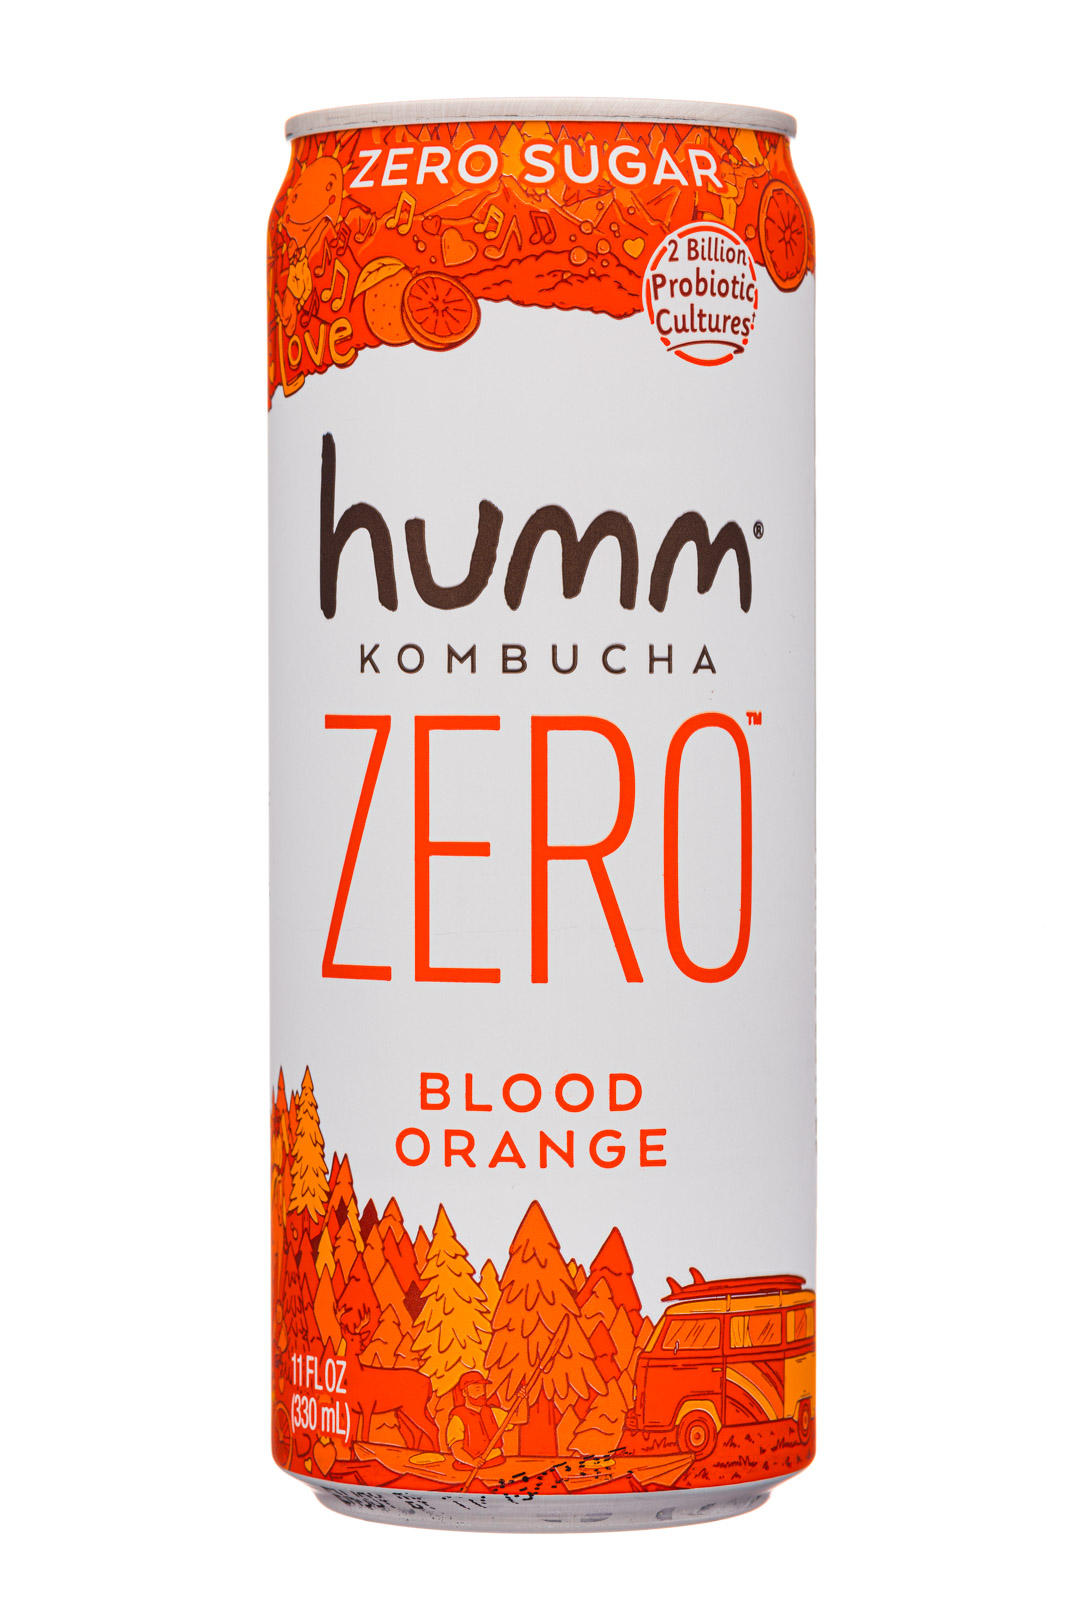 humm kombucha: Humm-11oz-2020-KombuchaZero-BloodOrange-Front